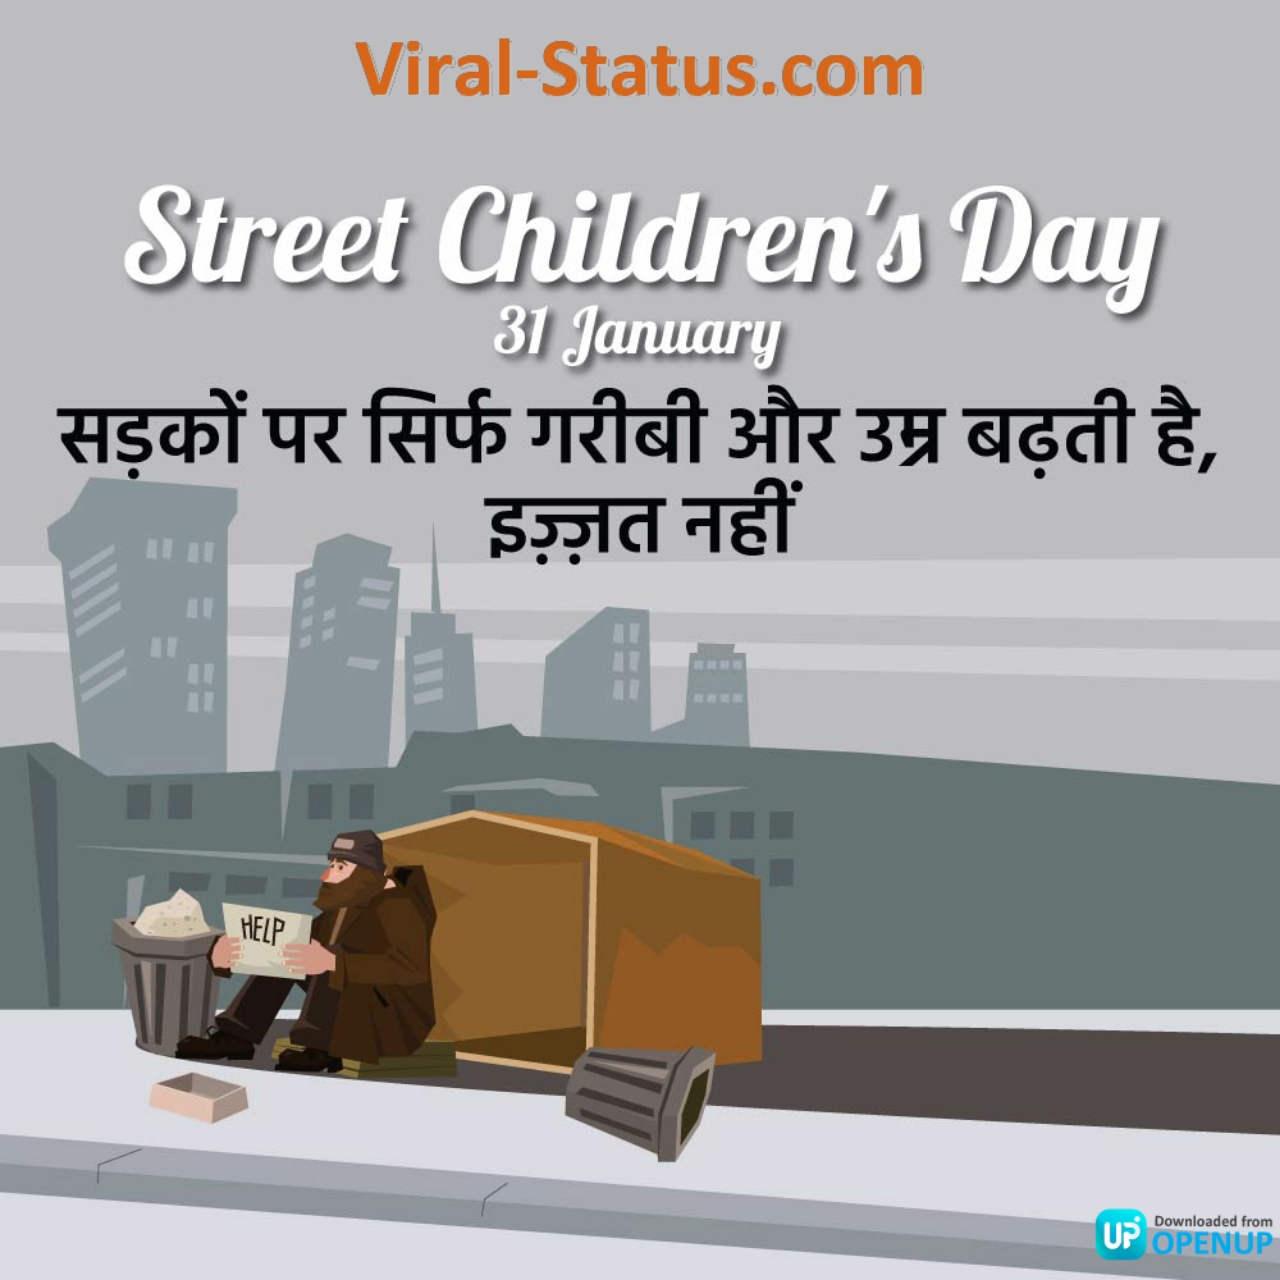 national street children's day